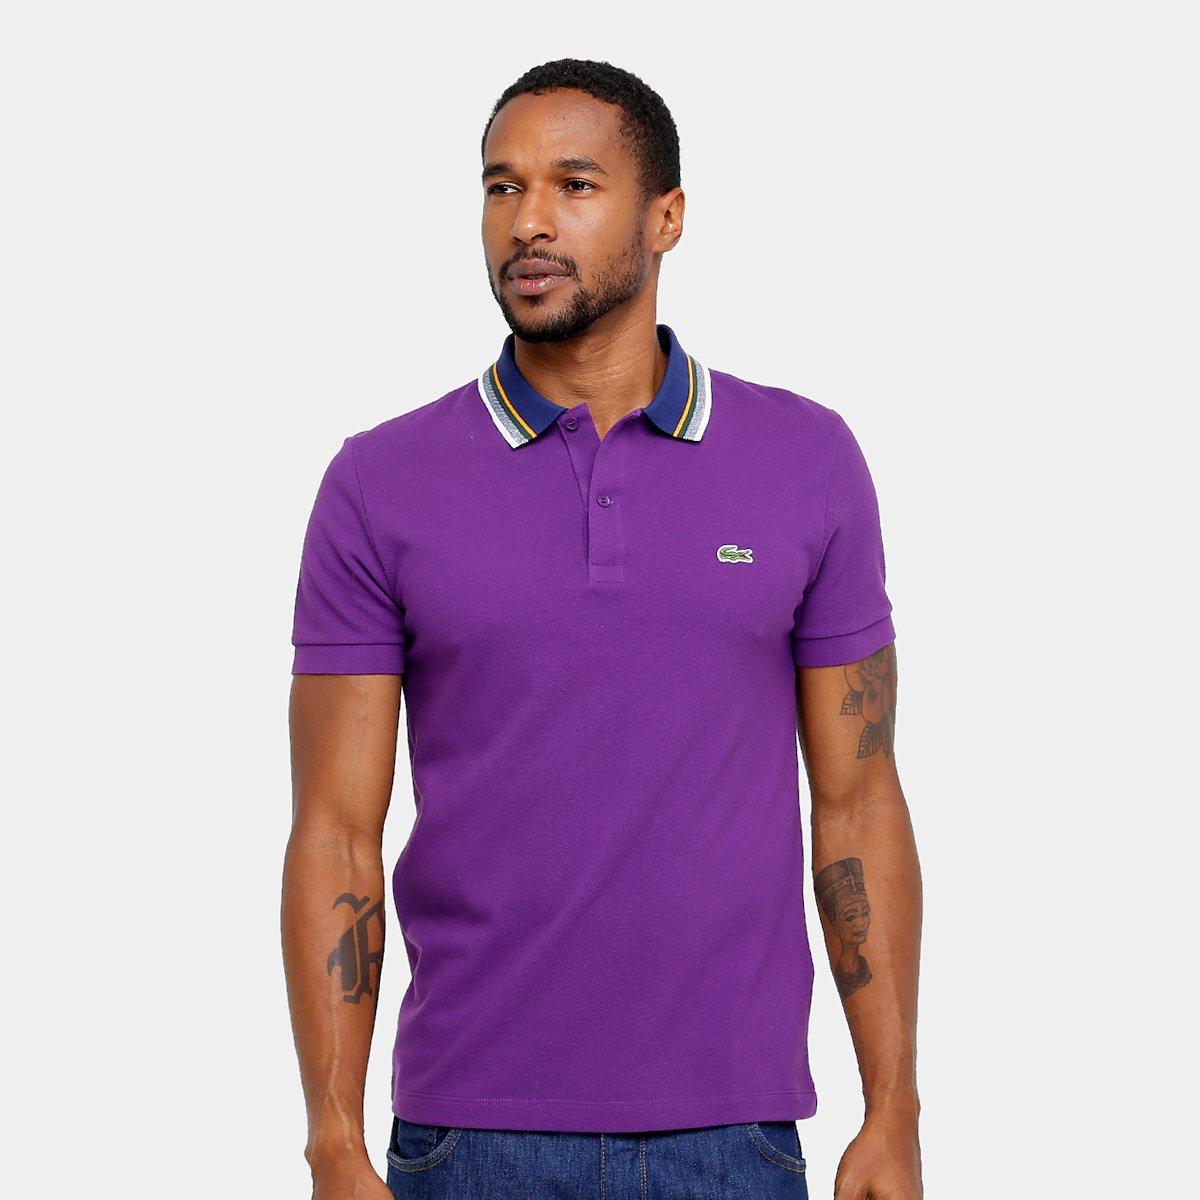 Camisa Polo Lacoste Piquet Regular Fit Gola Color Masculina Compre